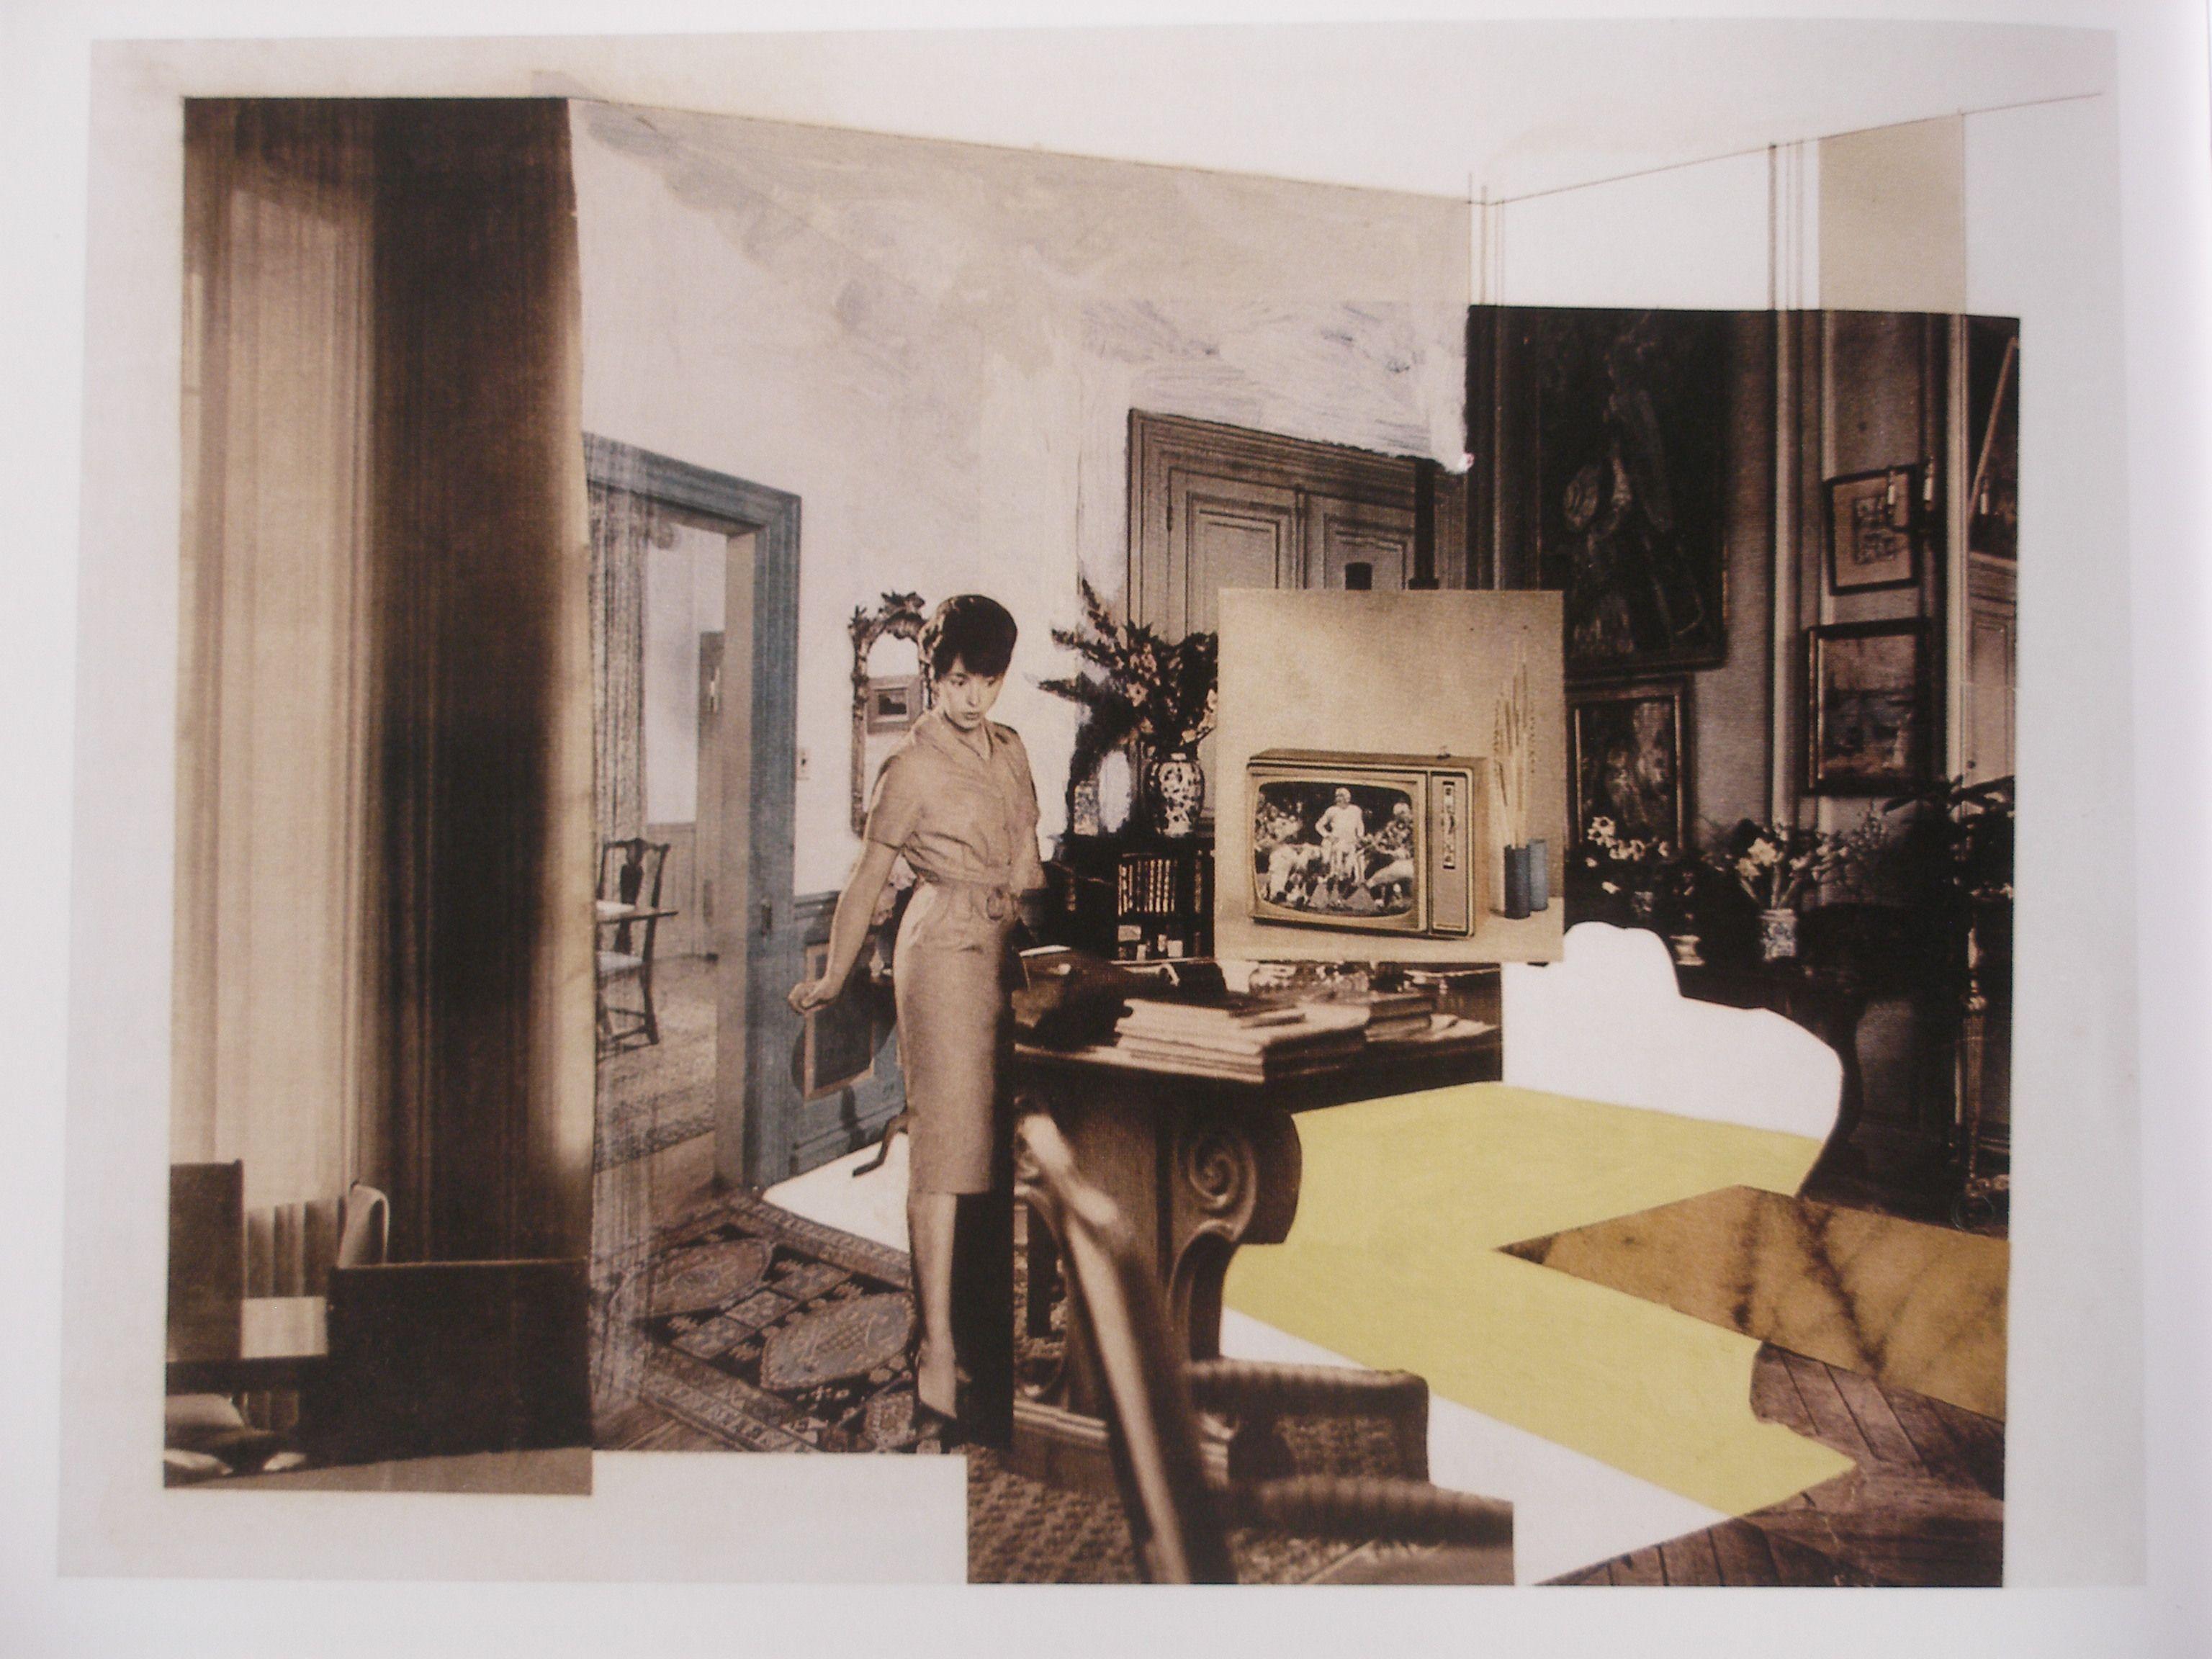 Richard Hamilton, Interior study, 1964 | Canvases | Pinterest | Collage